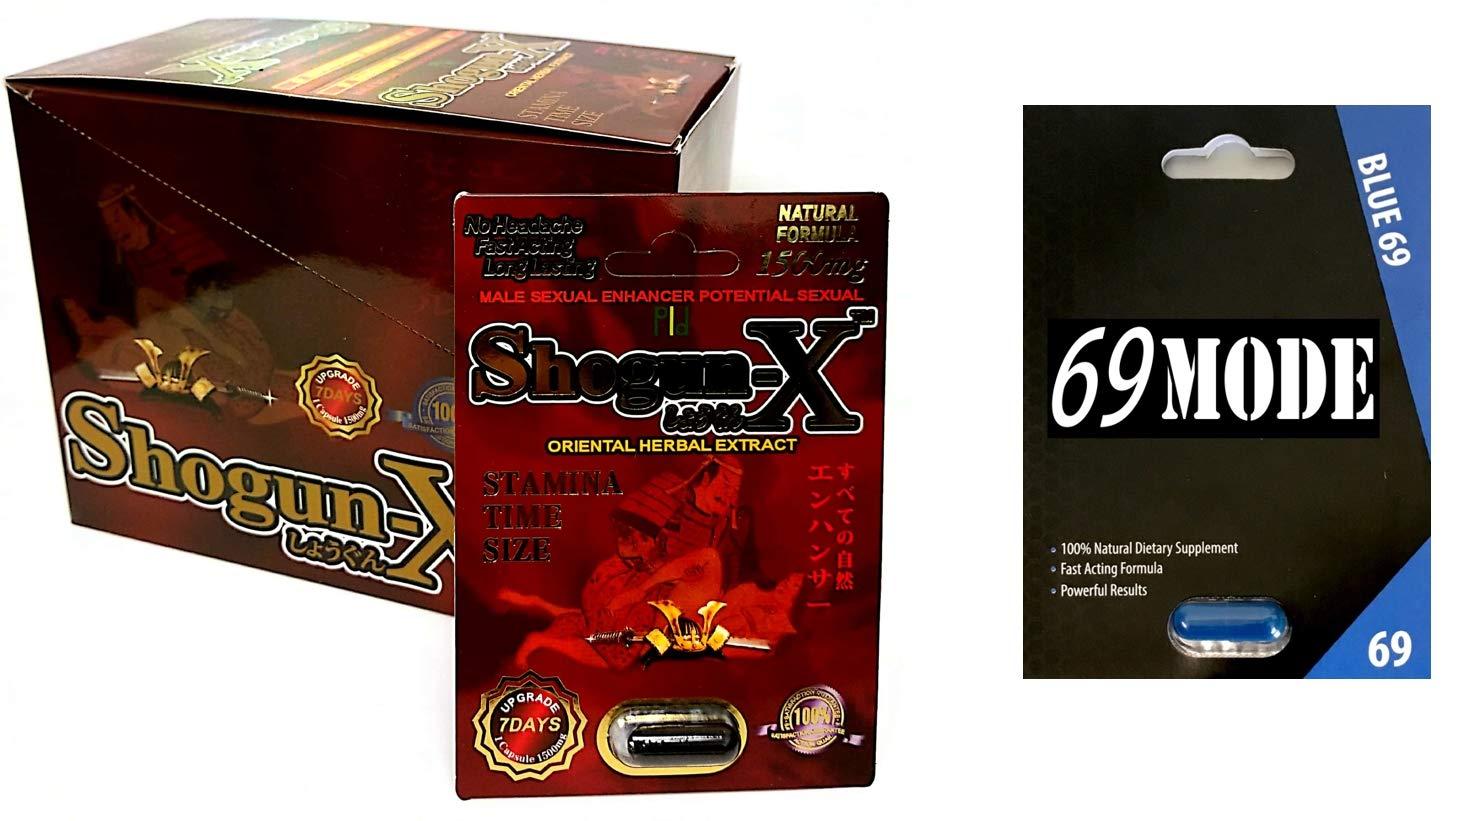 Shogun-X 1500mg 24Pills in The Box 69MODE Blue69 1Pill Male Sexual Enhancing Formula by ShogunX 69Mode